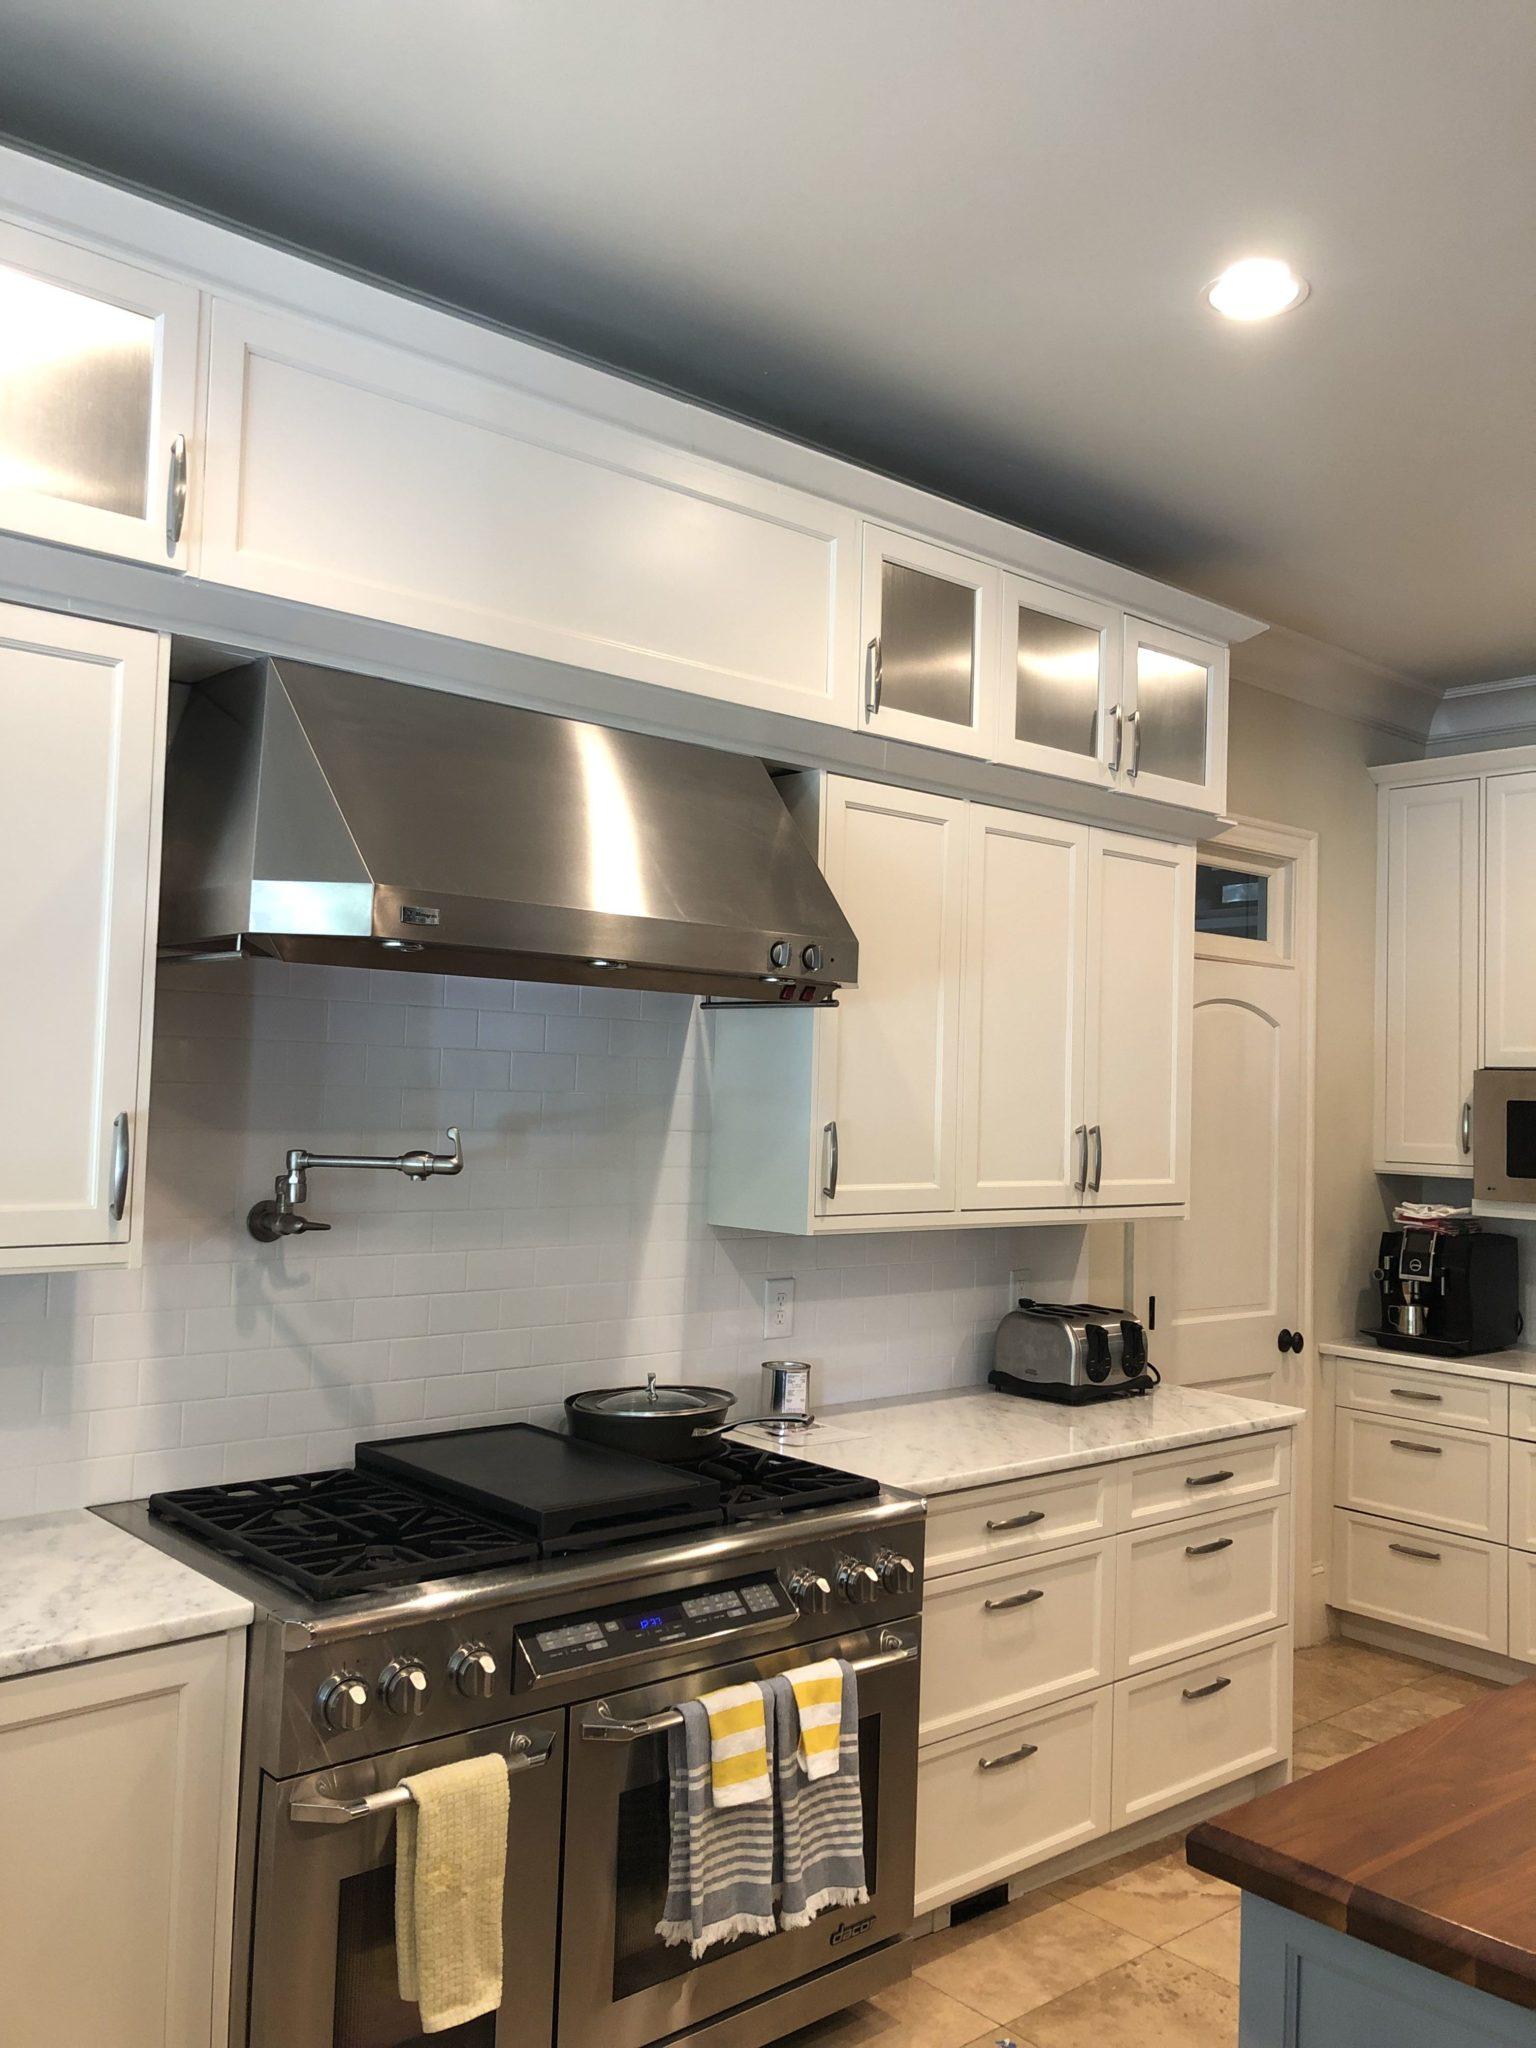 Panda White Kitchen - 2 Cabinet Girls